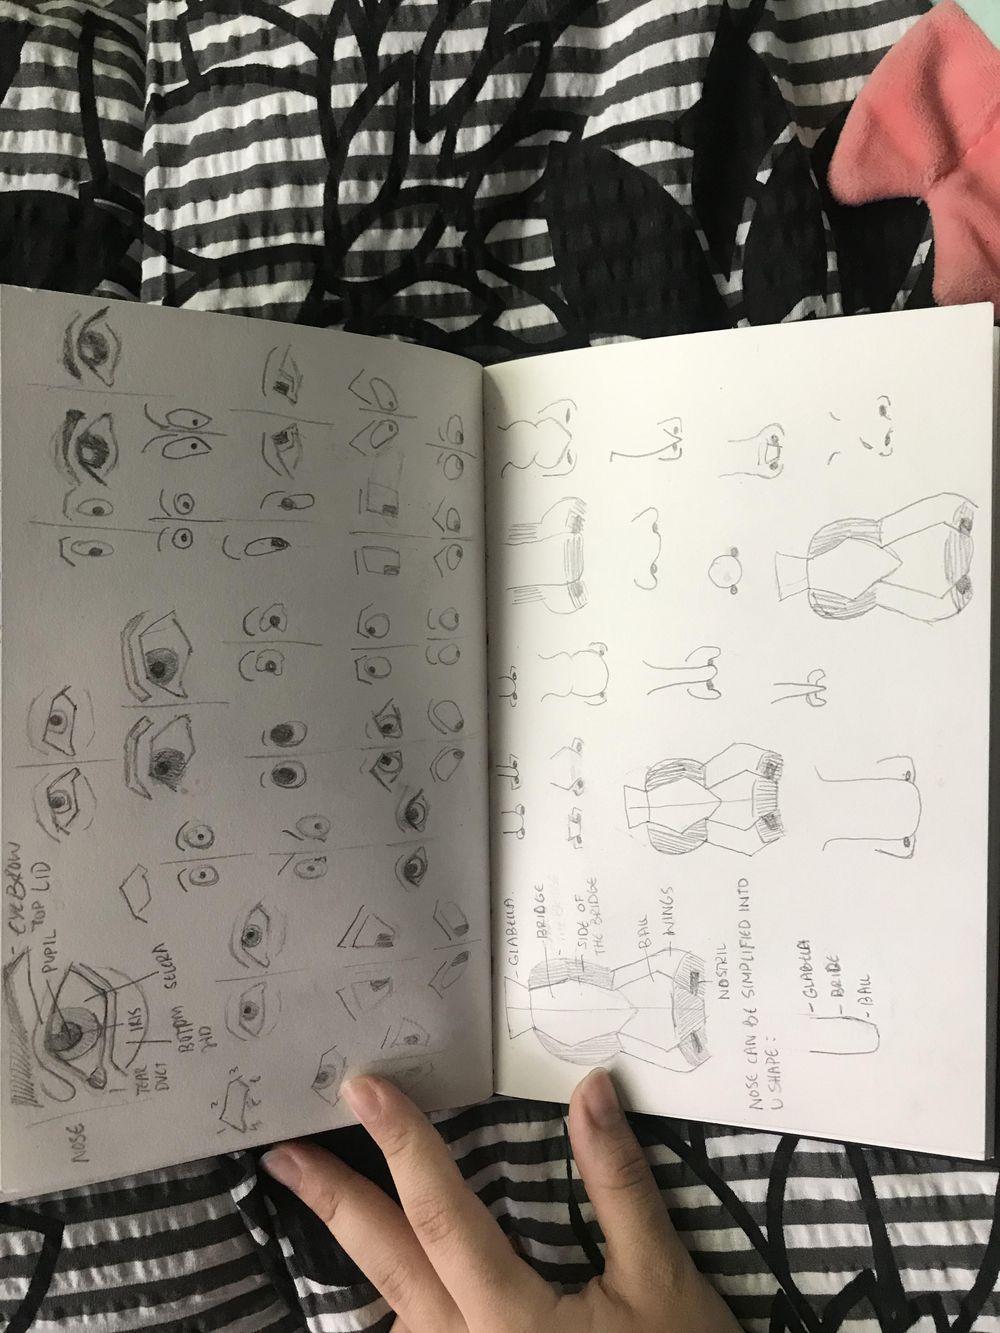 Portrait + sketches! - image 2 - student project